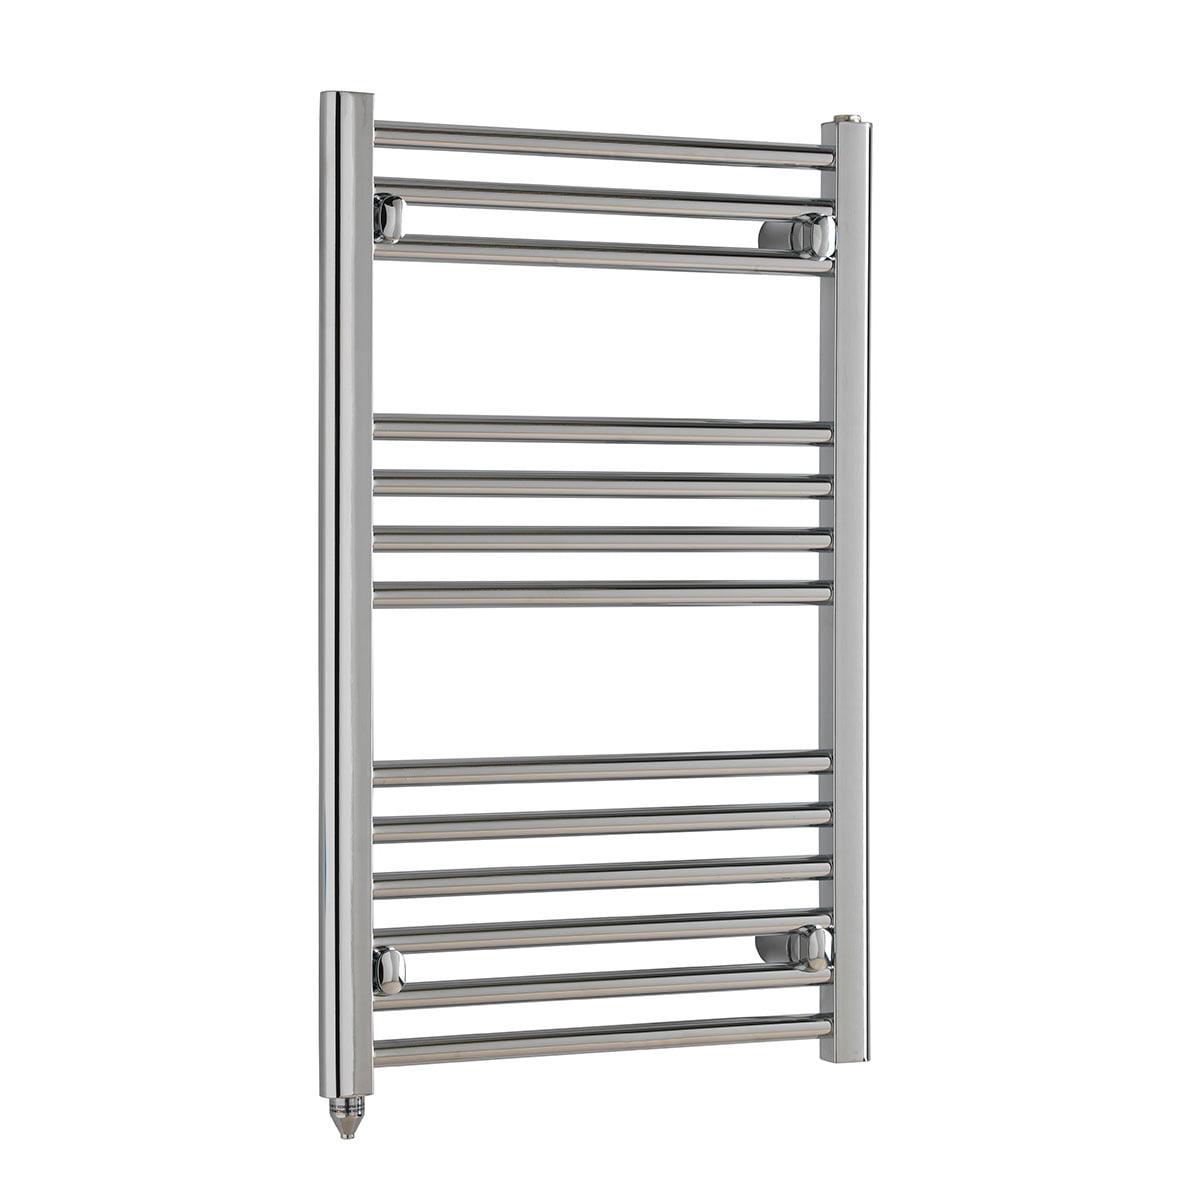 tradesman-budget-electric-heated-towel-rail-warmer-chrome-small-500-800-mm